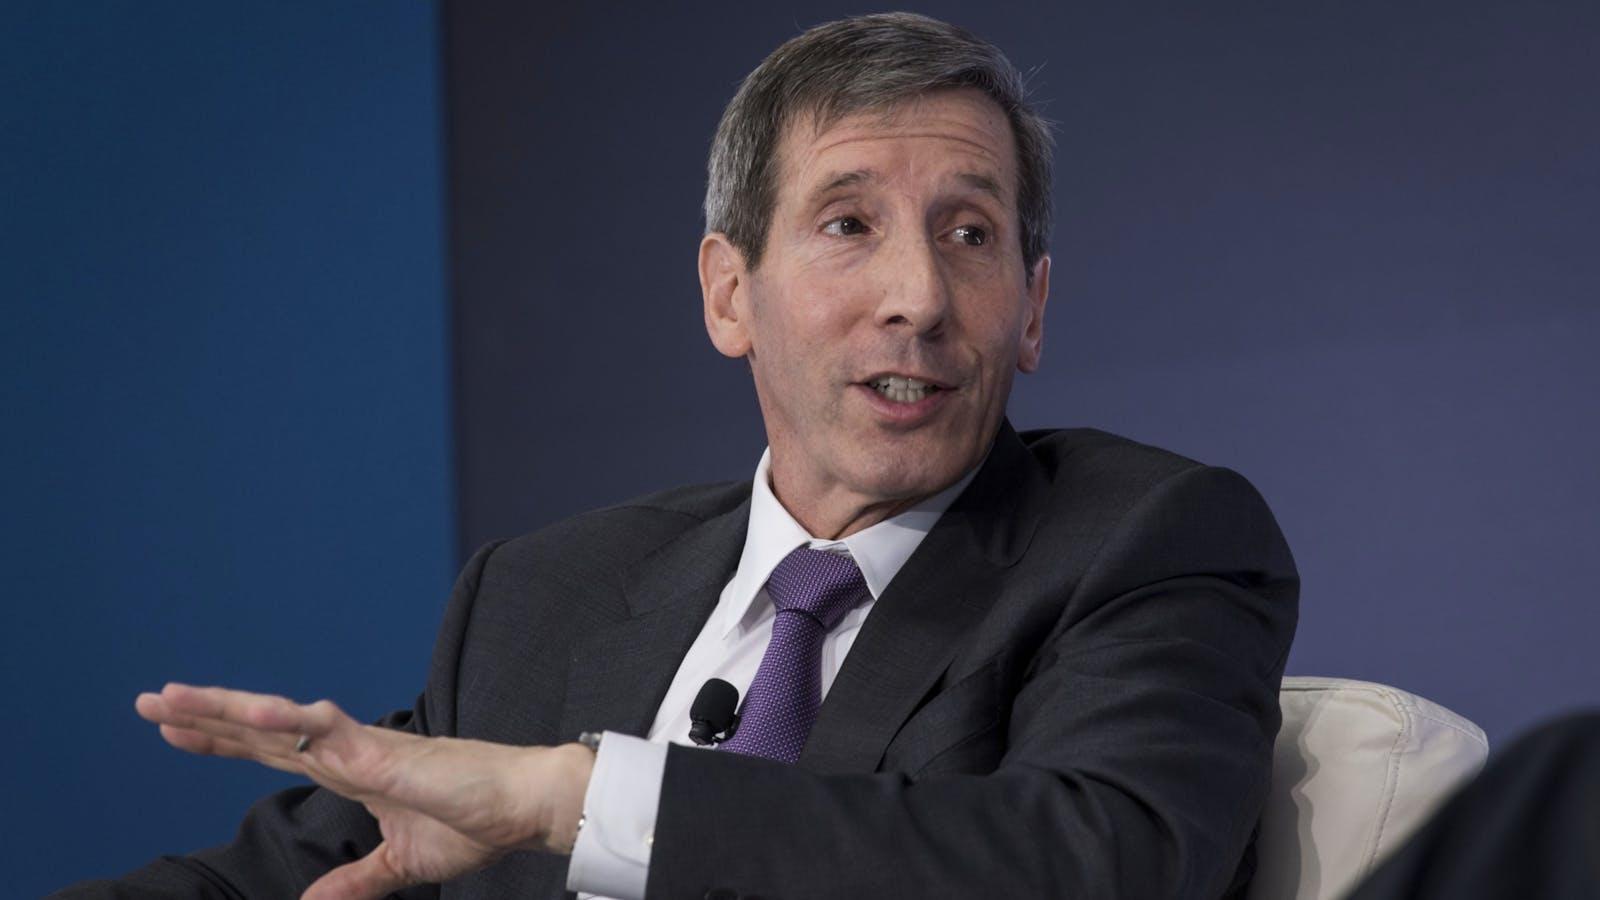 FTC Chairman Joseph Simons. Photo by Bloomberg